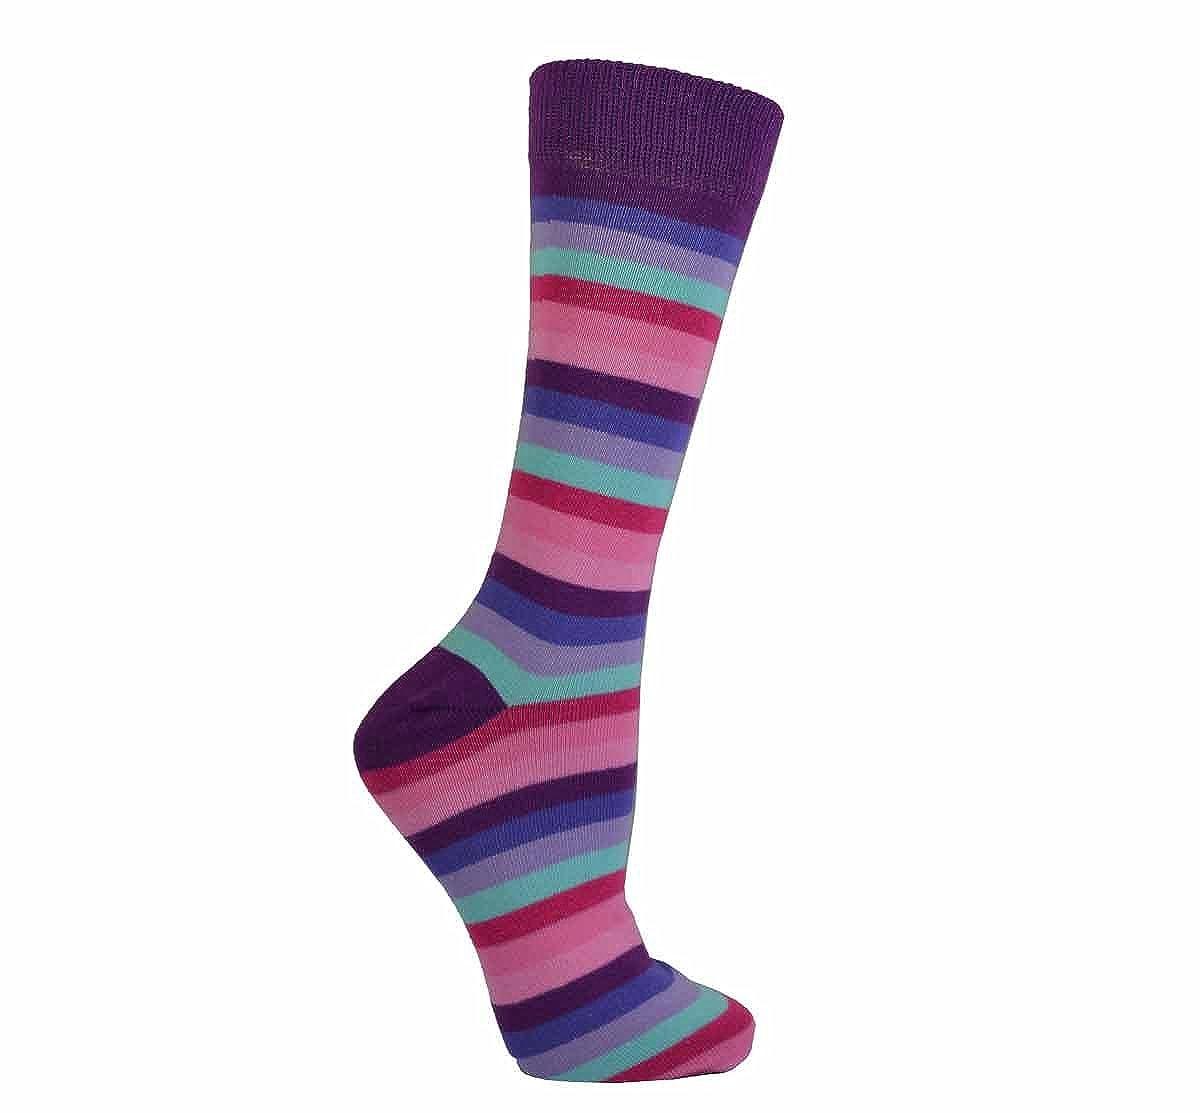 Designer Gents Essential Striped Socks Comfortable Mens Socks Cotton Rich Breathable